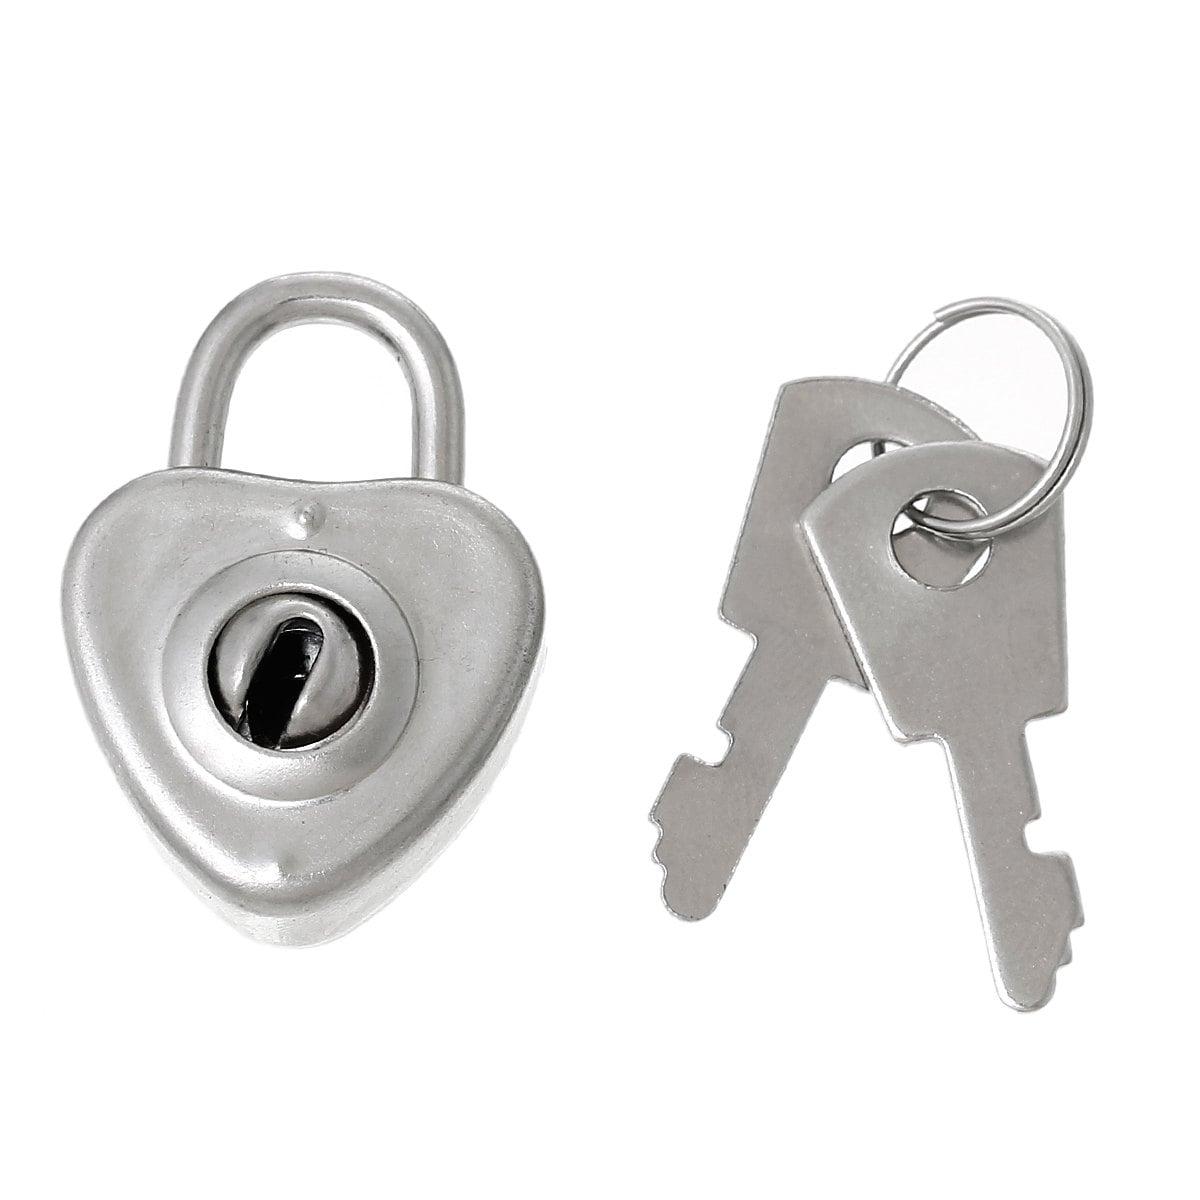 4 sets silver tone metal jewelry box lock and keys charm for Jewelry box with key